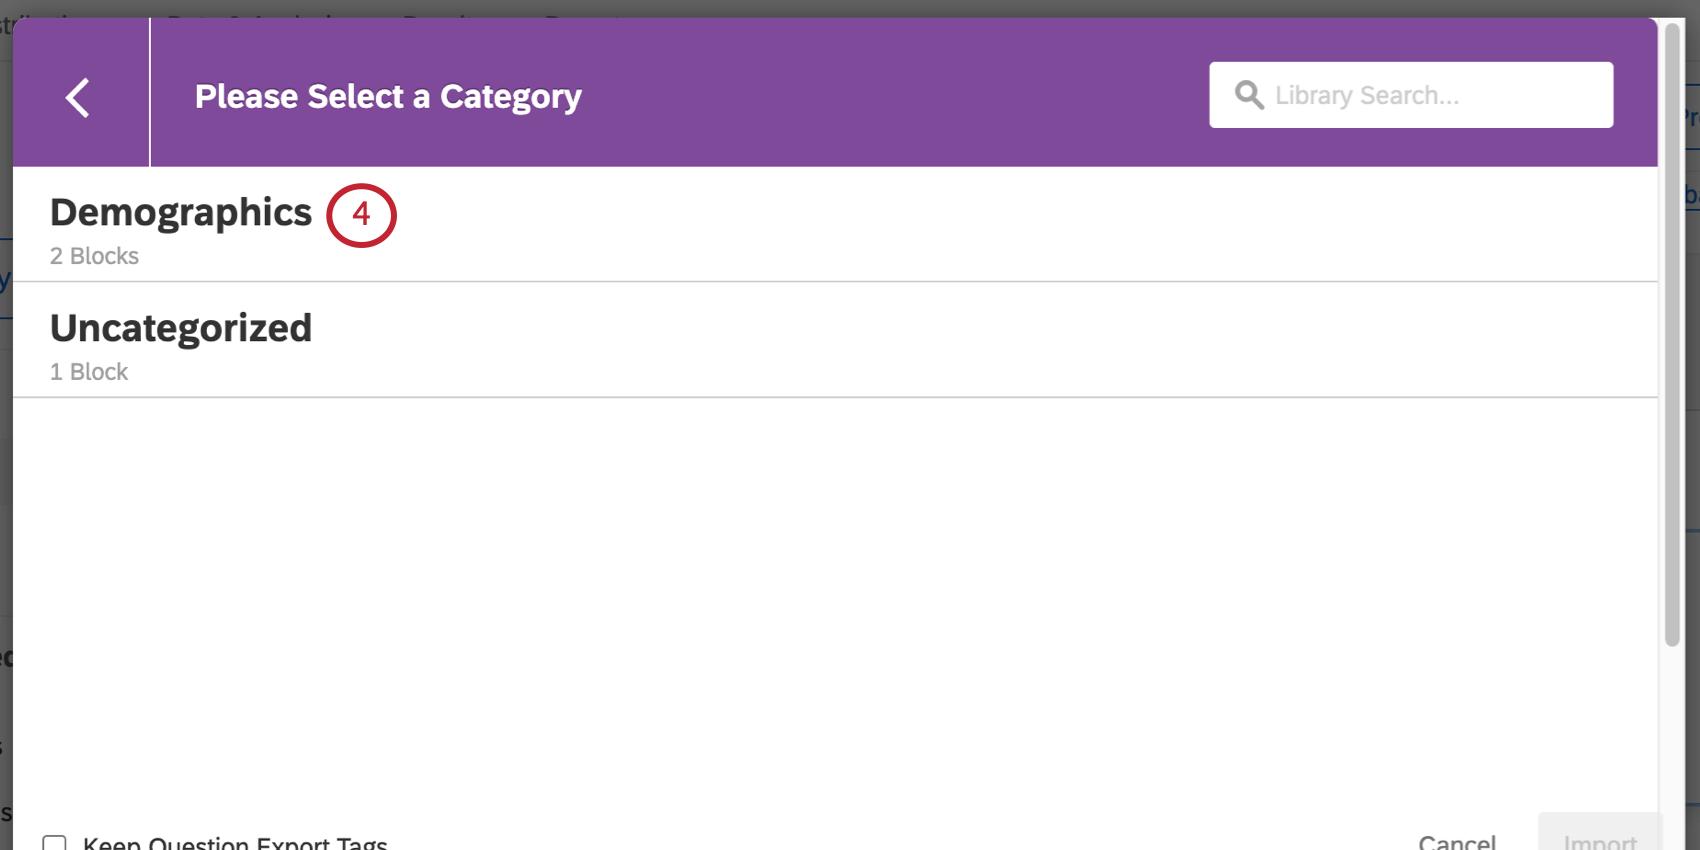 selecting the demographics block